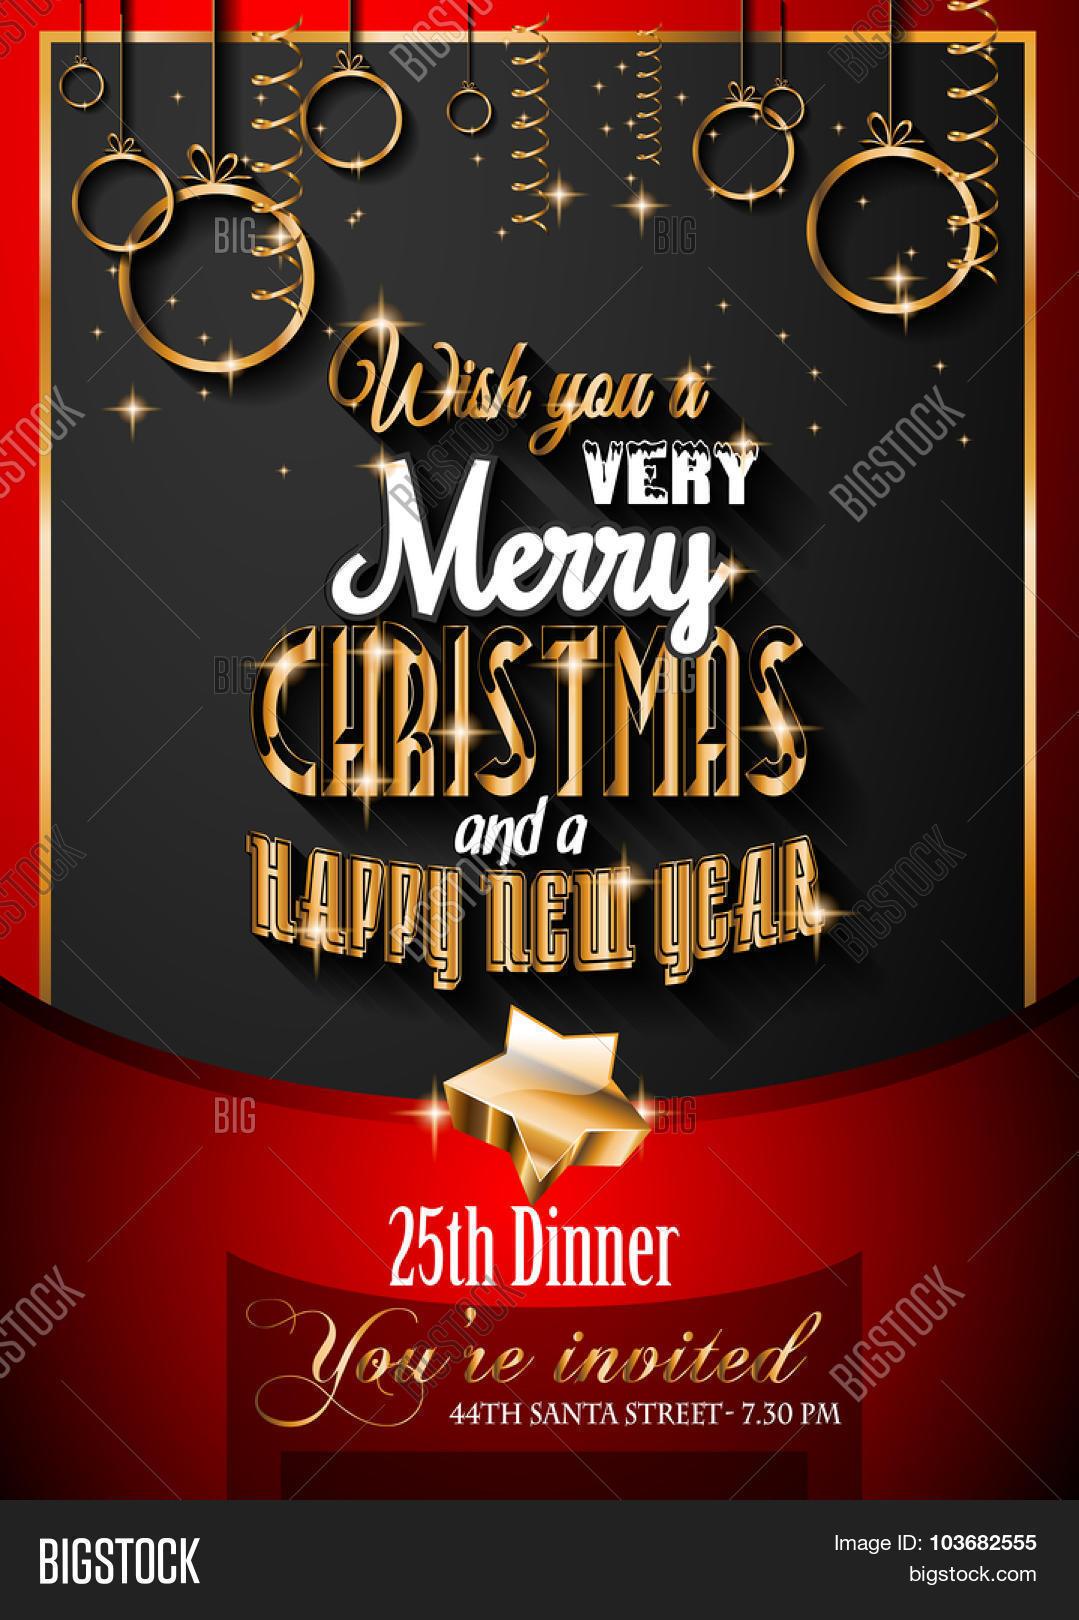 Christmas Restaurant Poster.Seasonal Christmas Vector Photo Free Trial Bigstock